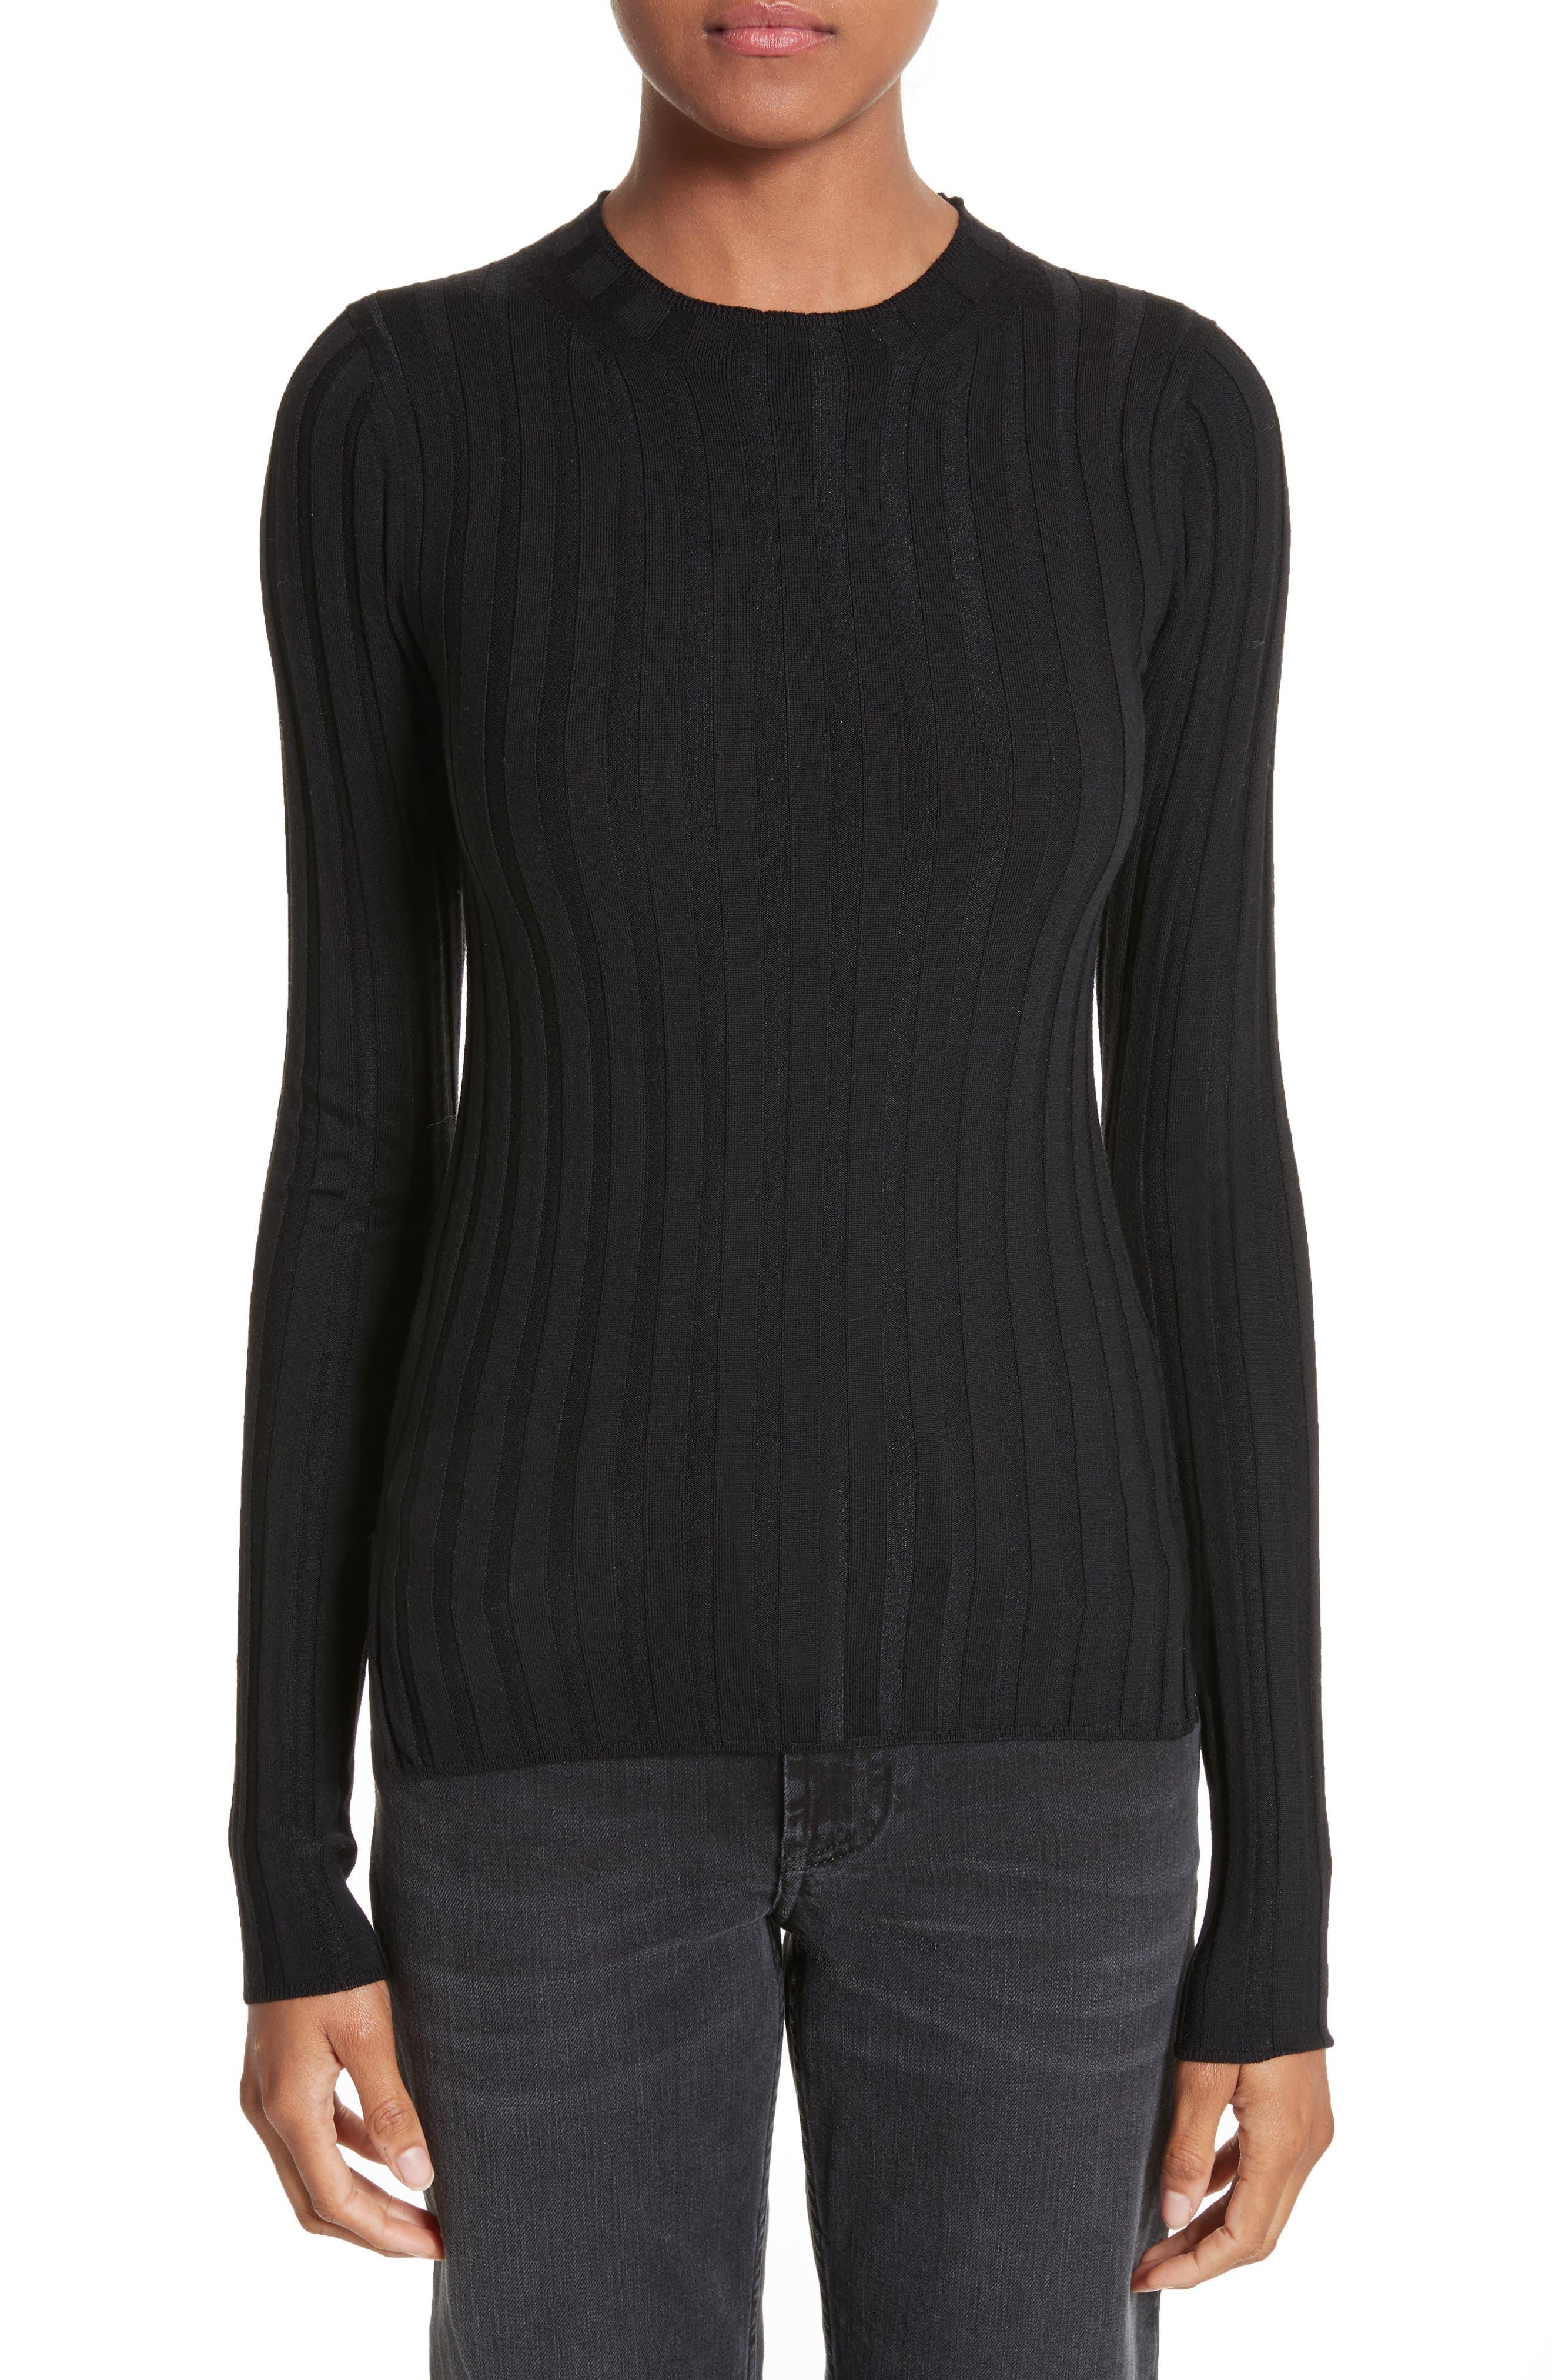 Main Image - ACNE Studios Carina Fitted Crewneck Sweater